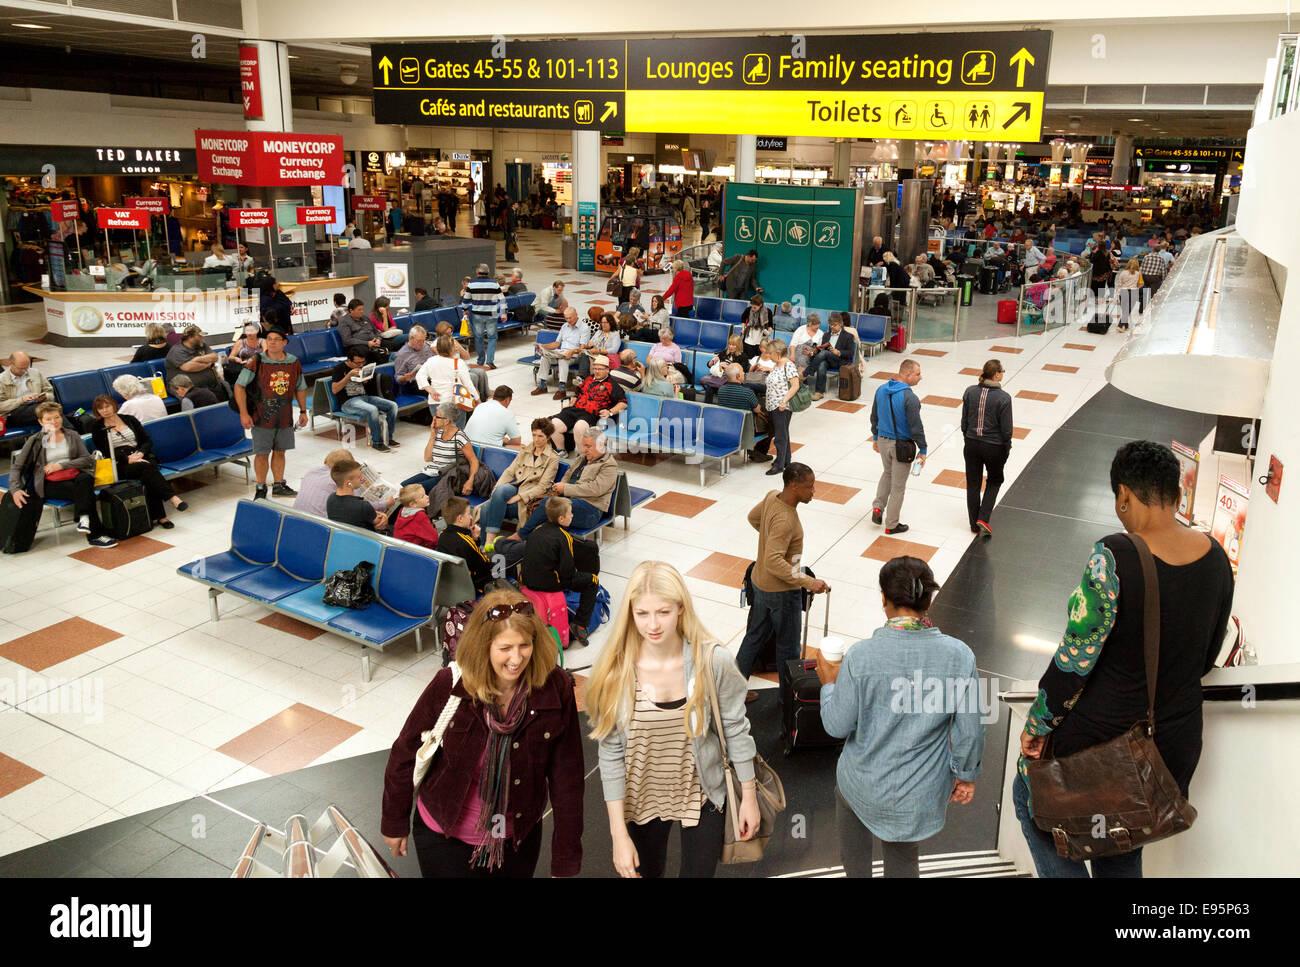 Gatwick Airport UK North terminal interior, - Stock Image